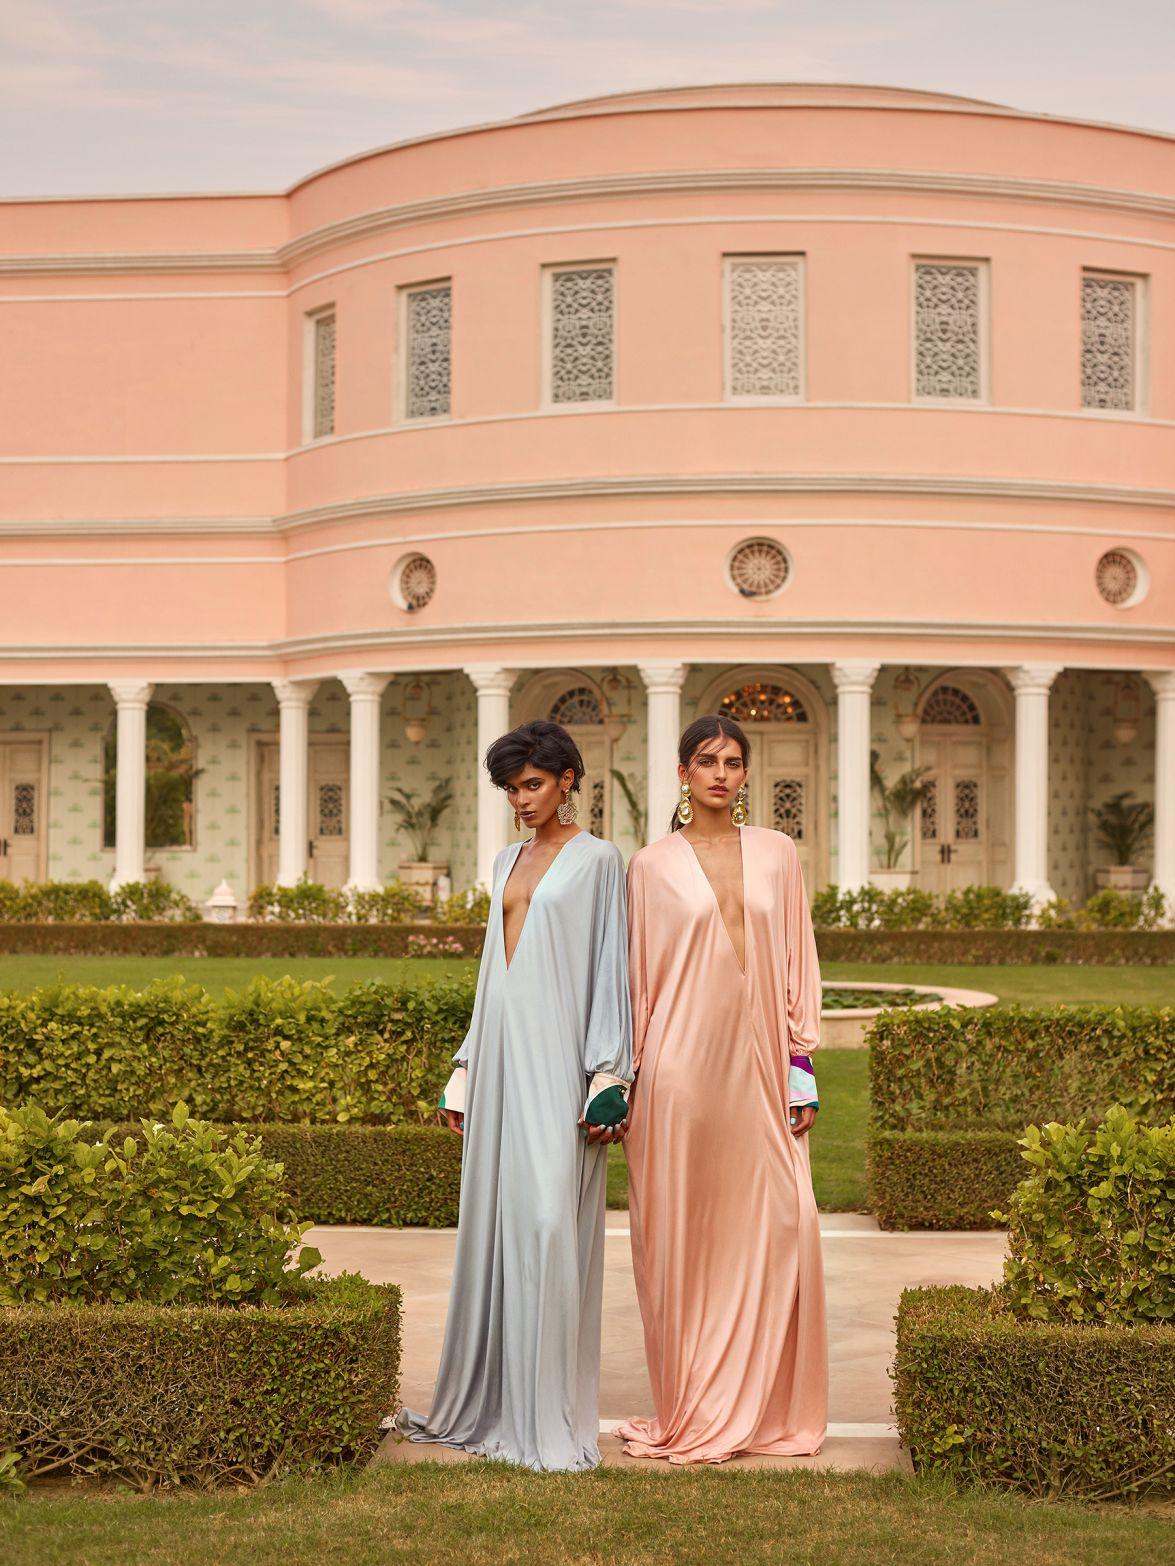 Vogue_Jaipur__O8A3334_yswgyp.jpg